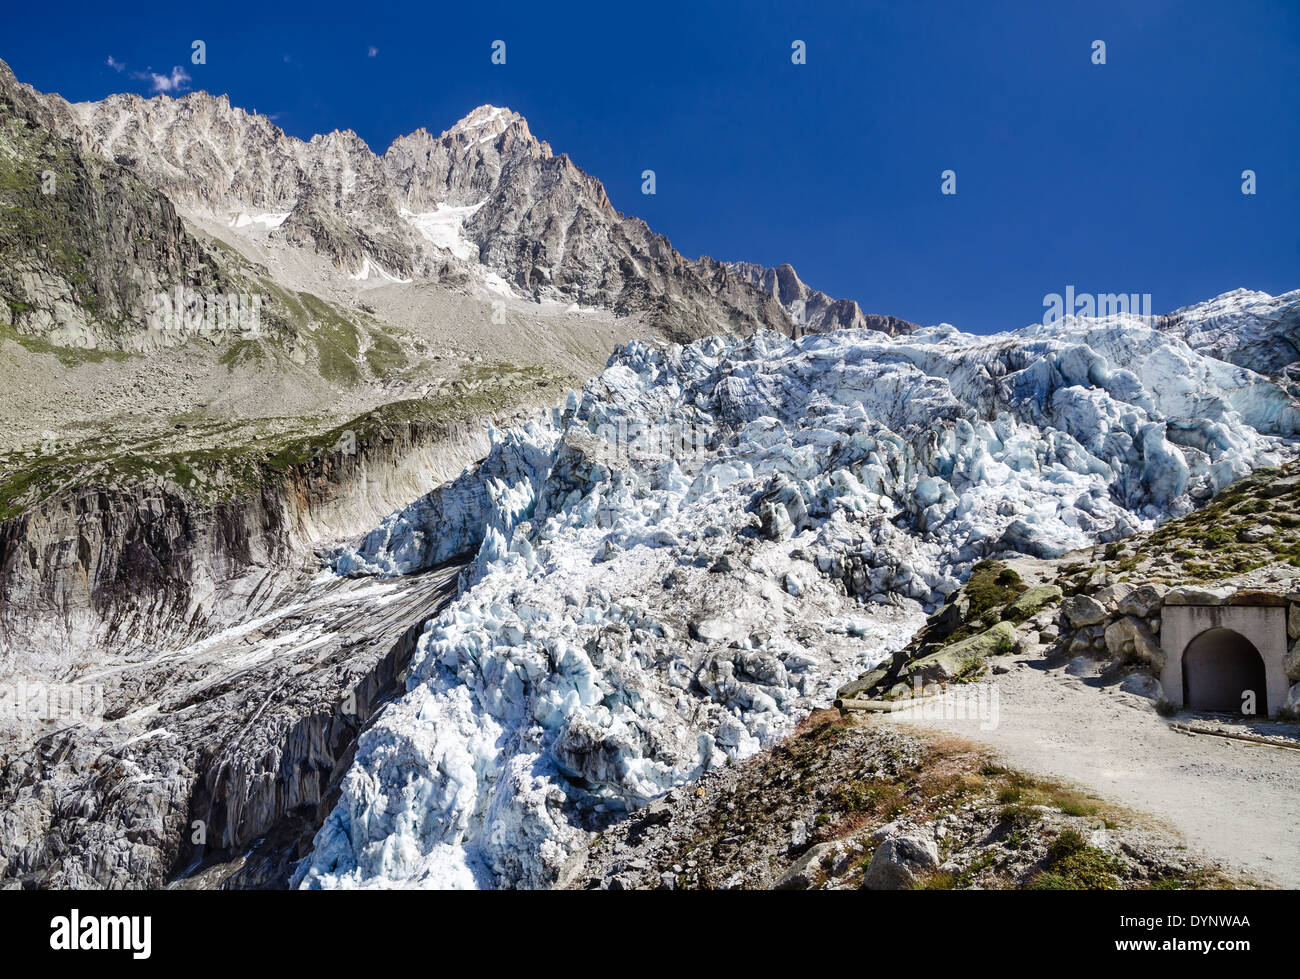 Argentiere Glacier in Chamonix Alps, Mont Blanc Massif, France. - Stock Image